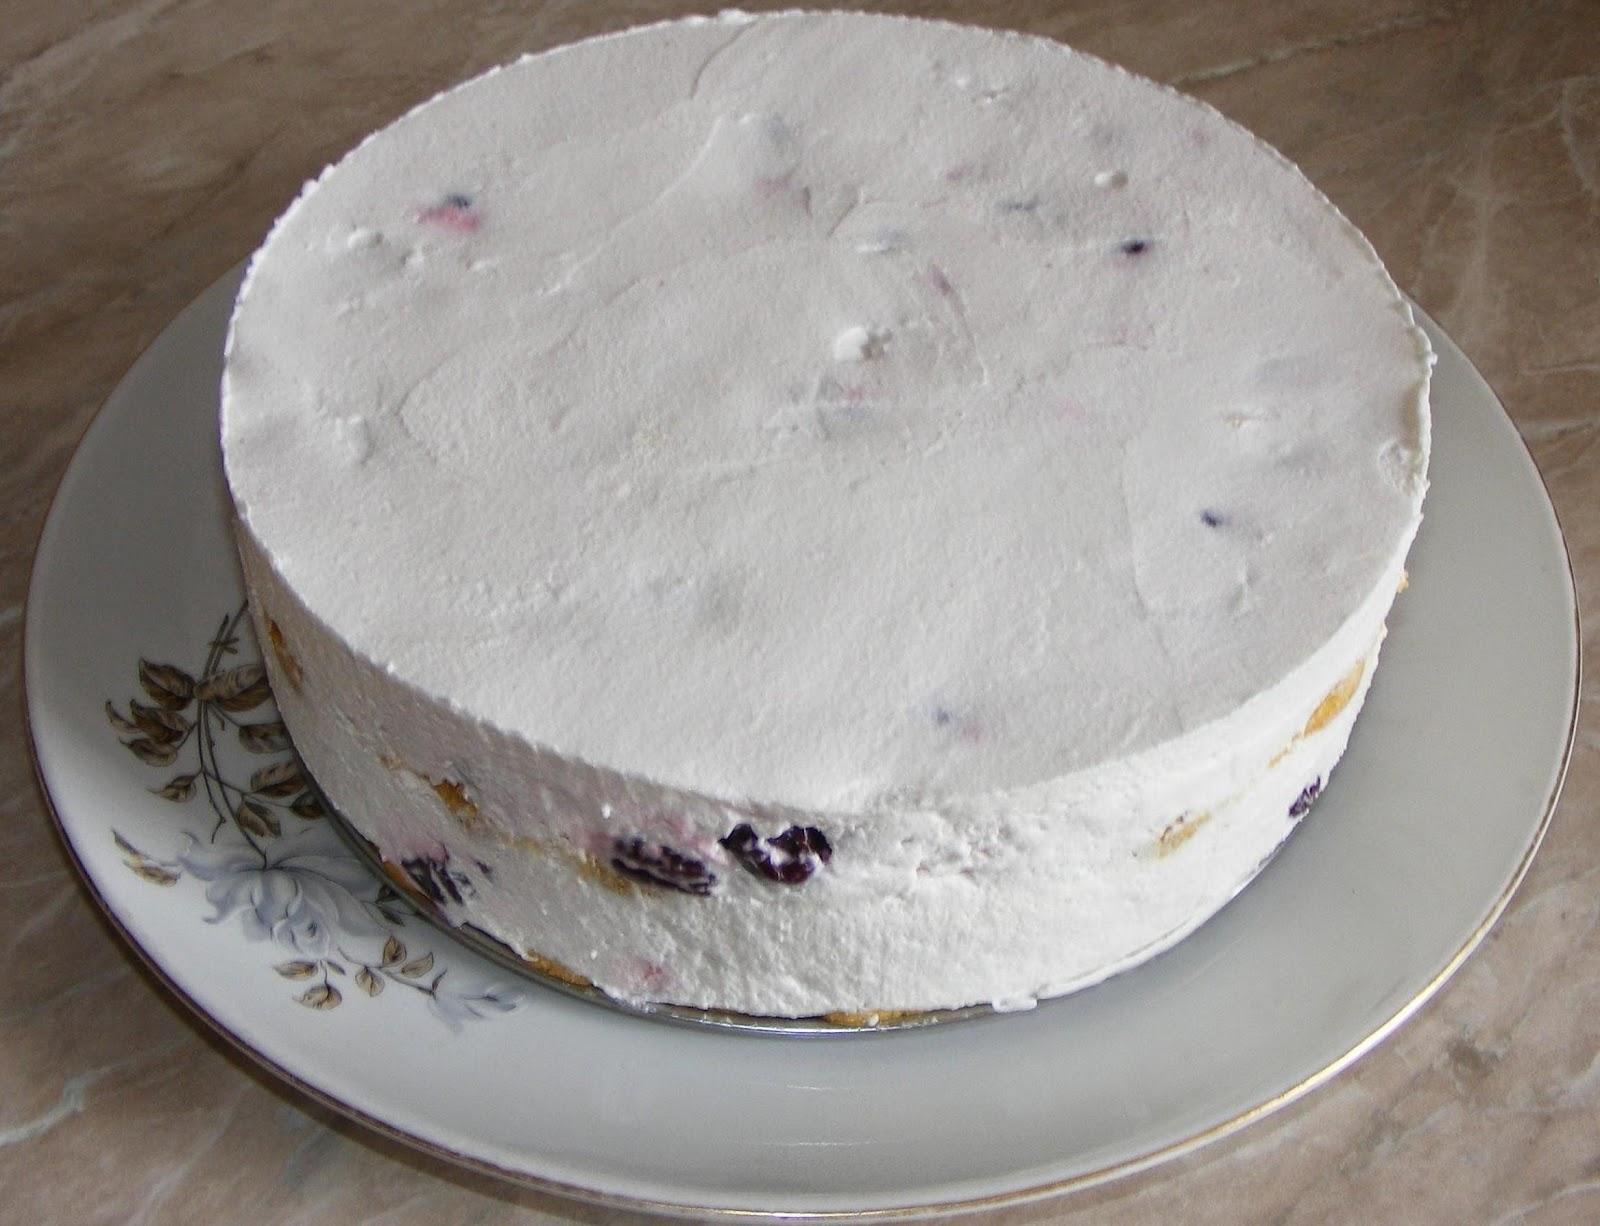 tort, torturi, prajitura, prajituri, dulciuri, deserturi, tort cu visine, tort cu piscoturi, tort de visine si piscoturi, prajitura cu visine, tort cu fructe, reteta tort, retete de tort, retete torturi, torturi de casa, retete culinare, preparate culinare, retete cu fructe,